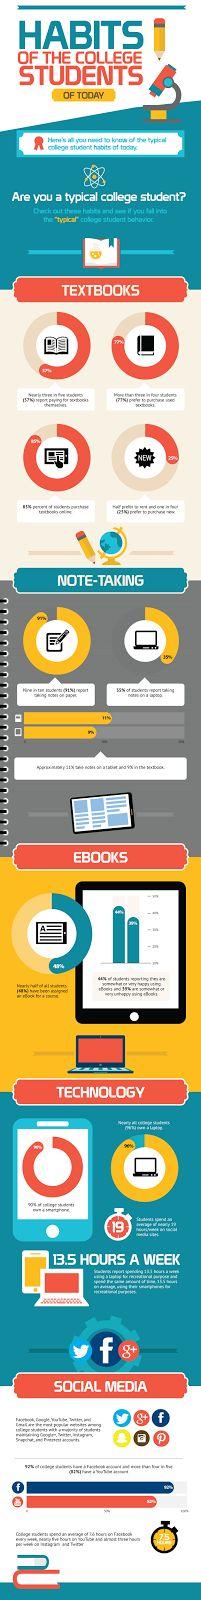 11 best SUNSHINE LEARN images on Pinterest | Learning, Learning ...